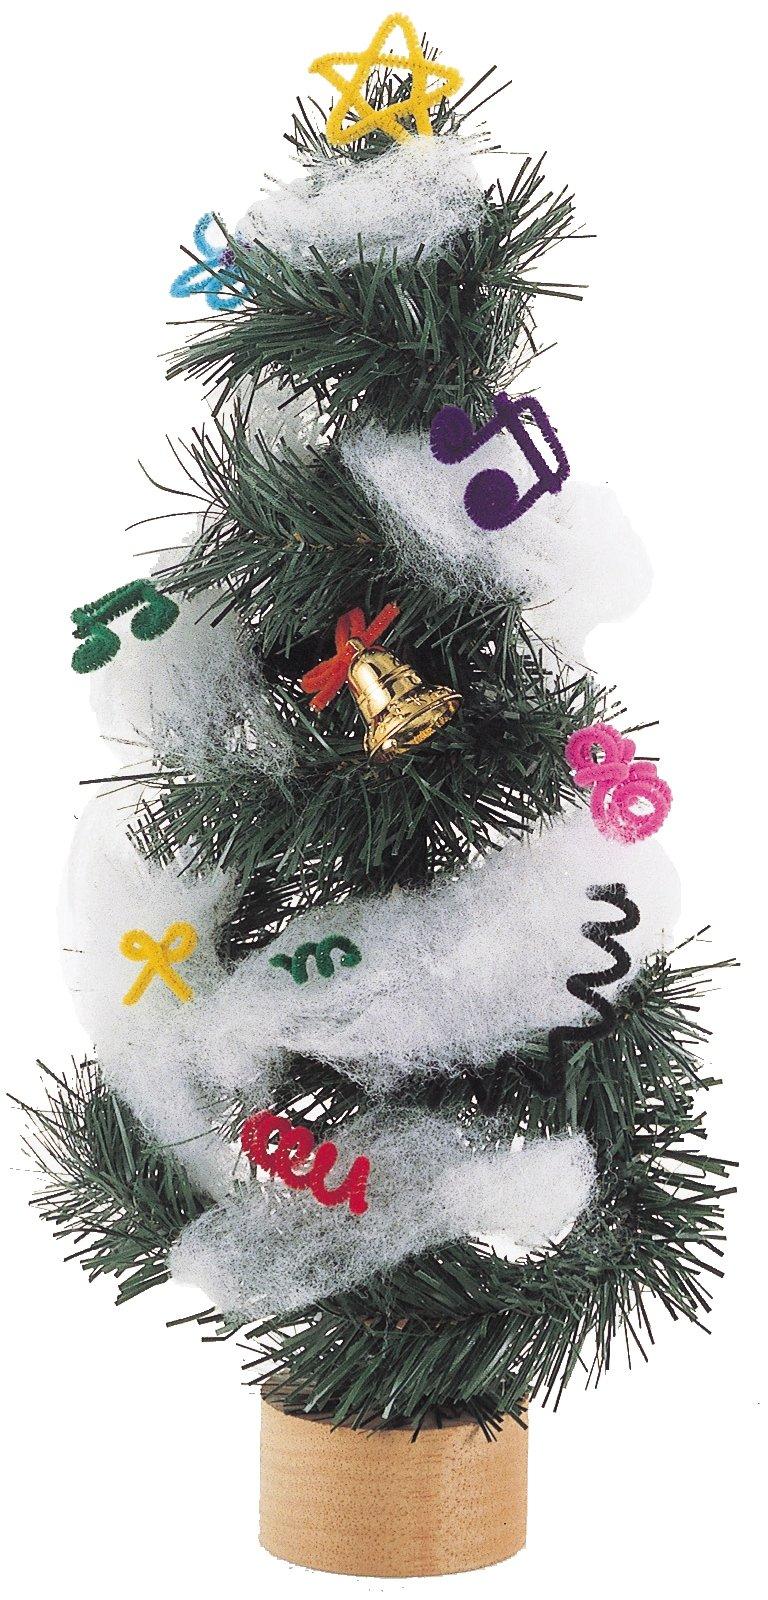 Artec 2460 Christmas Tree Kit